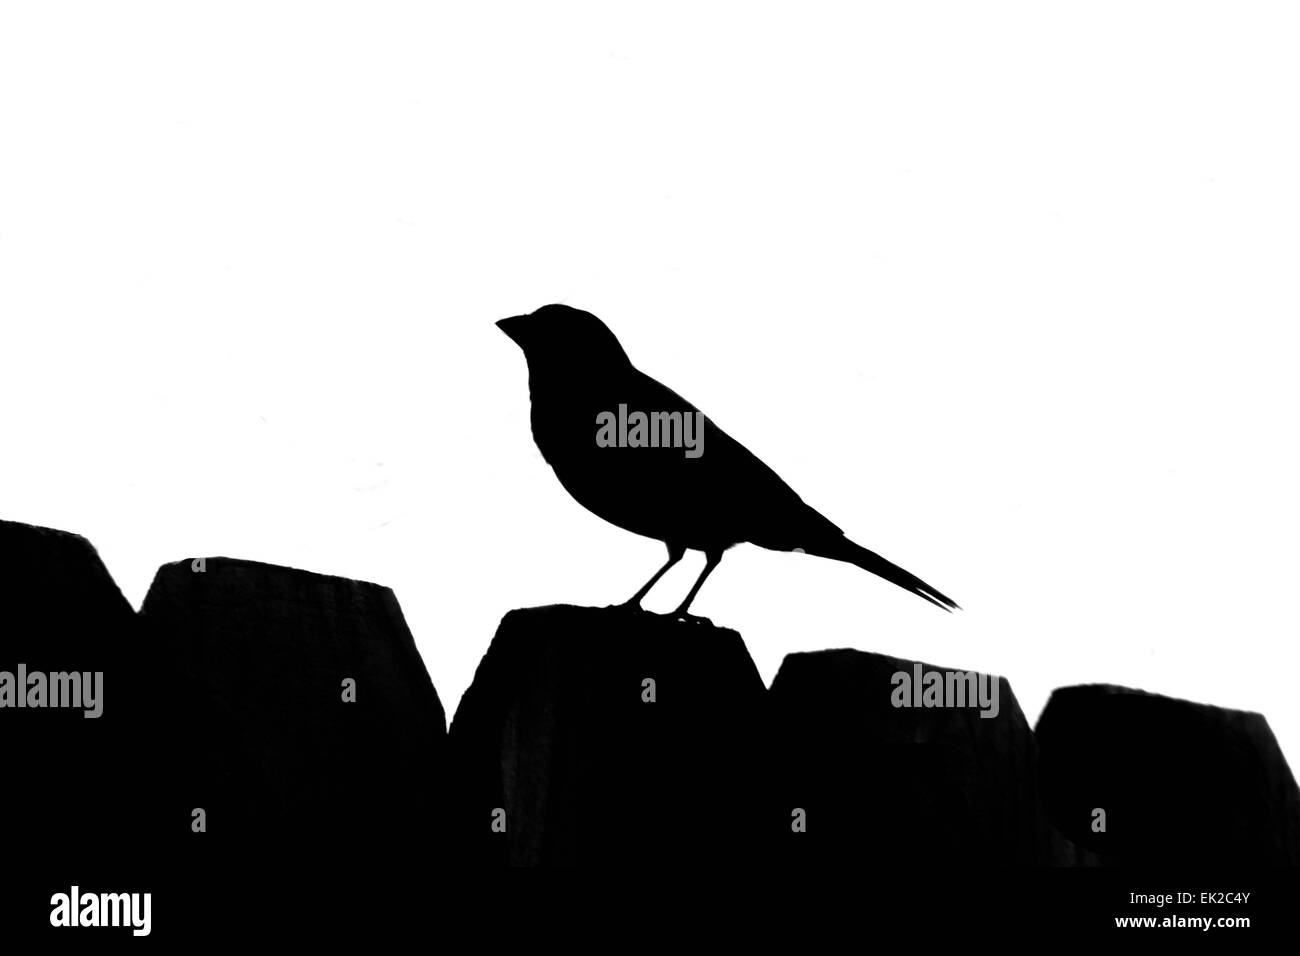 Songbird Silhouette - Stock Image